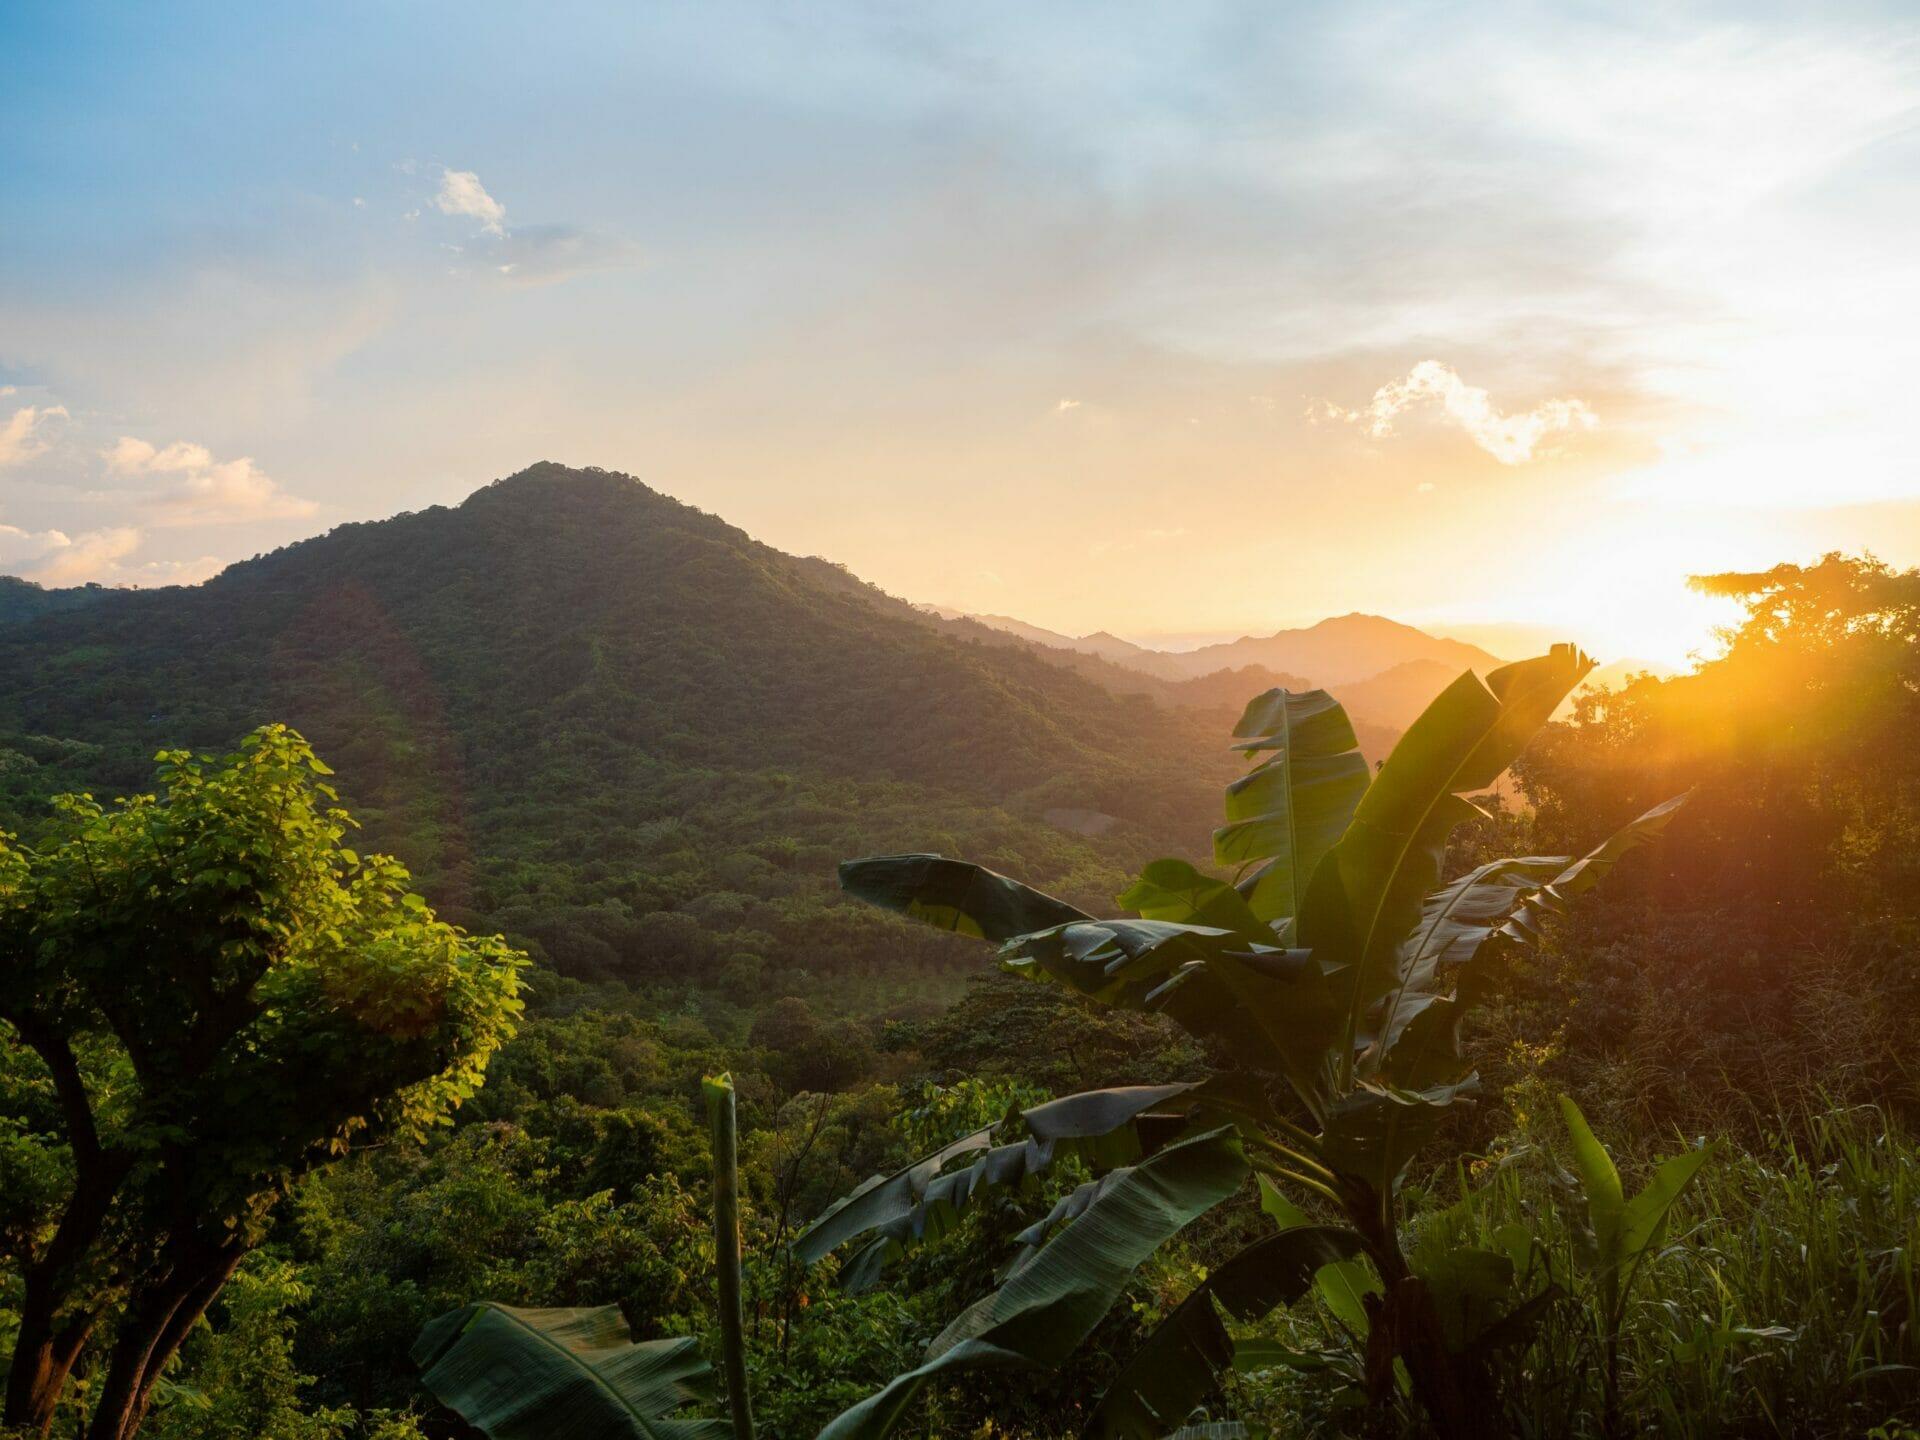 sunset jungle Casa Loma Minca Colombia